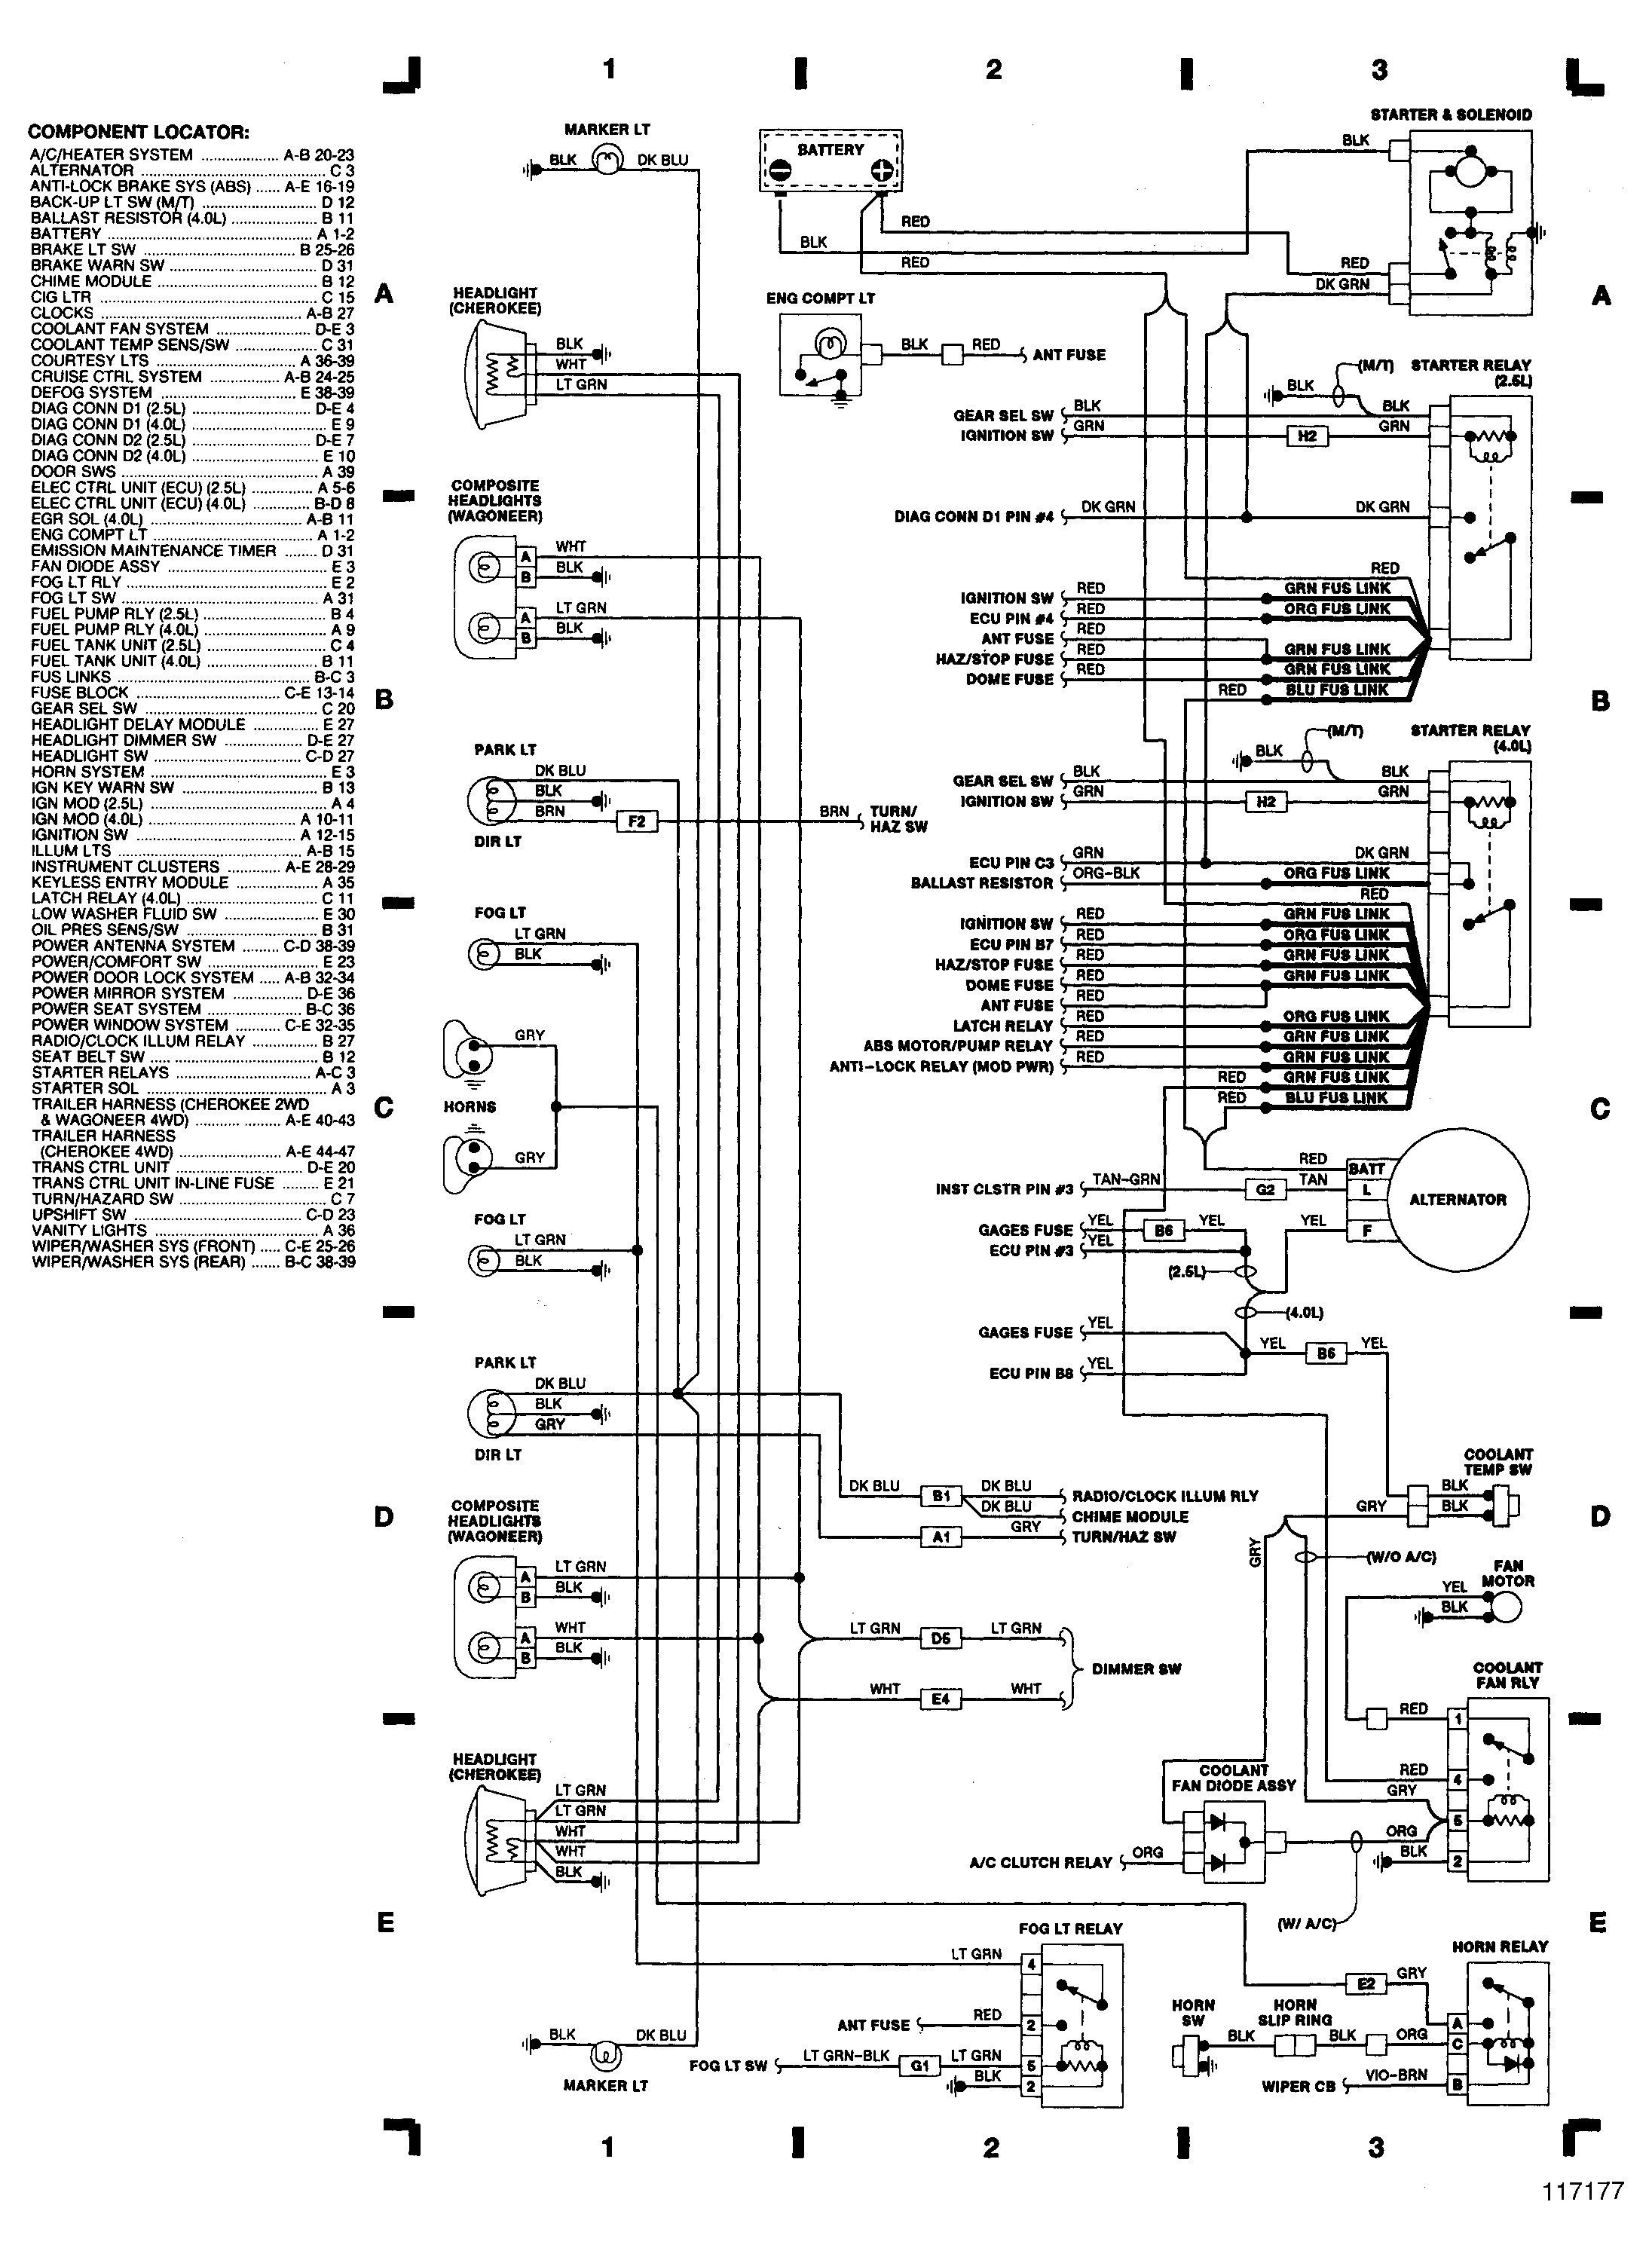 hight resolution of fresh wiring diagram yamaha aerox diagrams digramssample fresh wiring diagram yamaha aerox diagrams digramssample diagramimages wiringdiagramsample